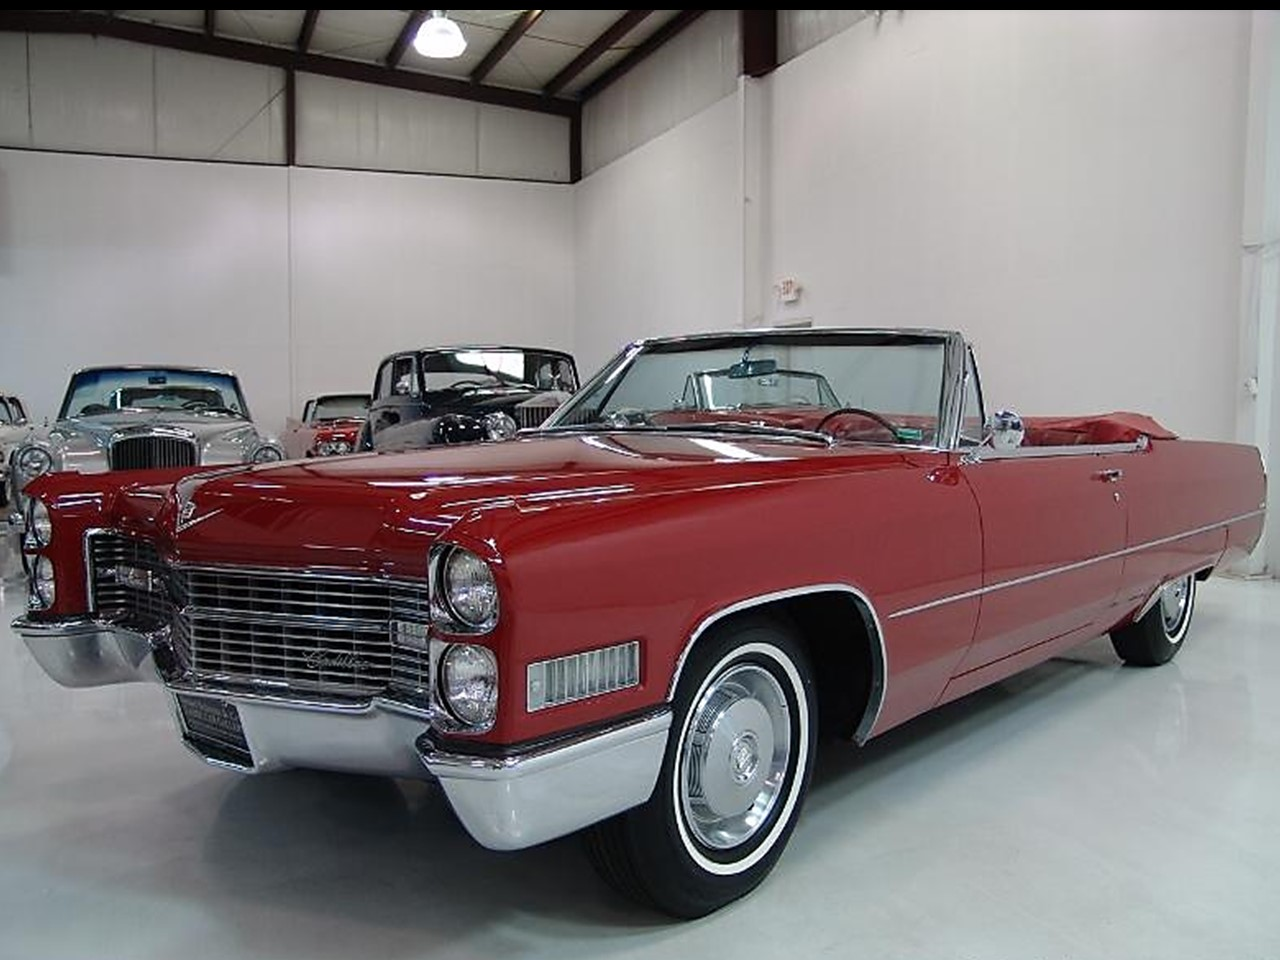 1966 Cadillac DeVille Convertible | NotoriousLuxury